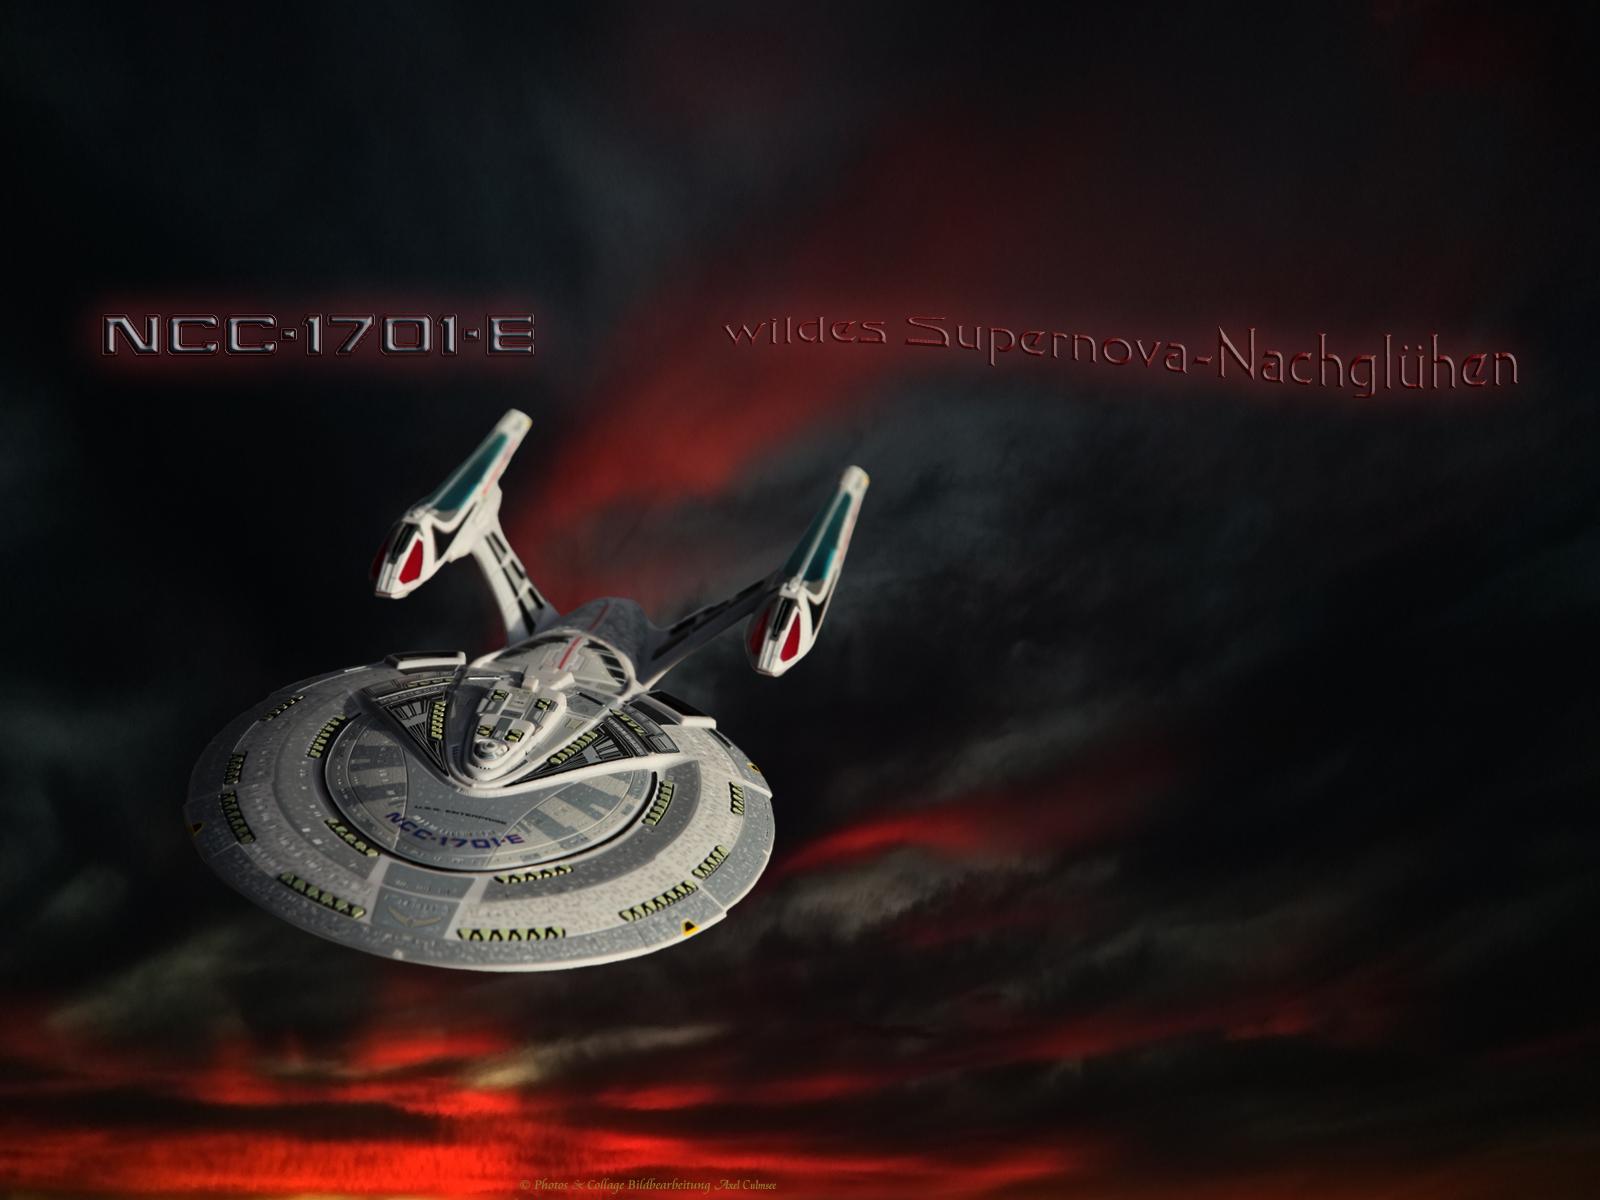 Enterprise-E in wildem Supernova-Nachgluehen